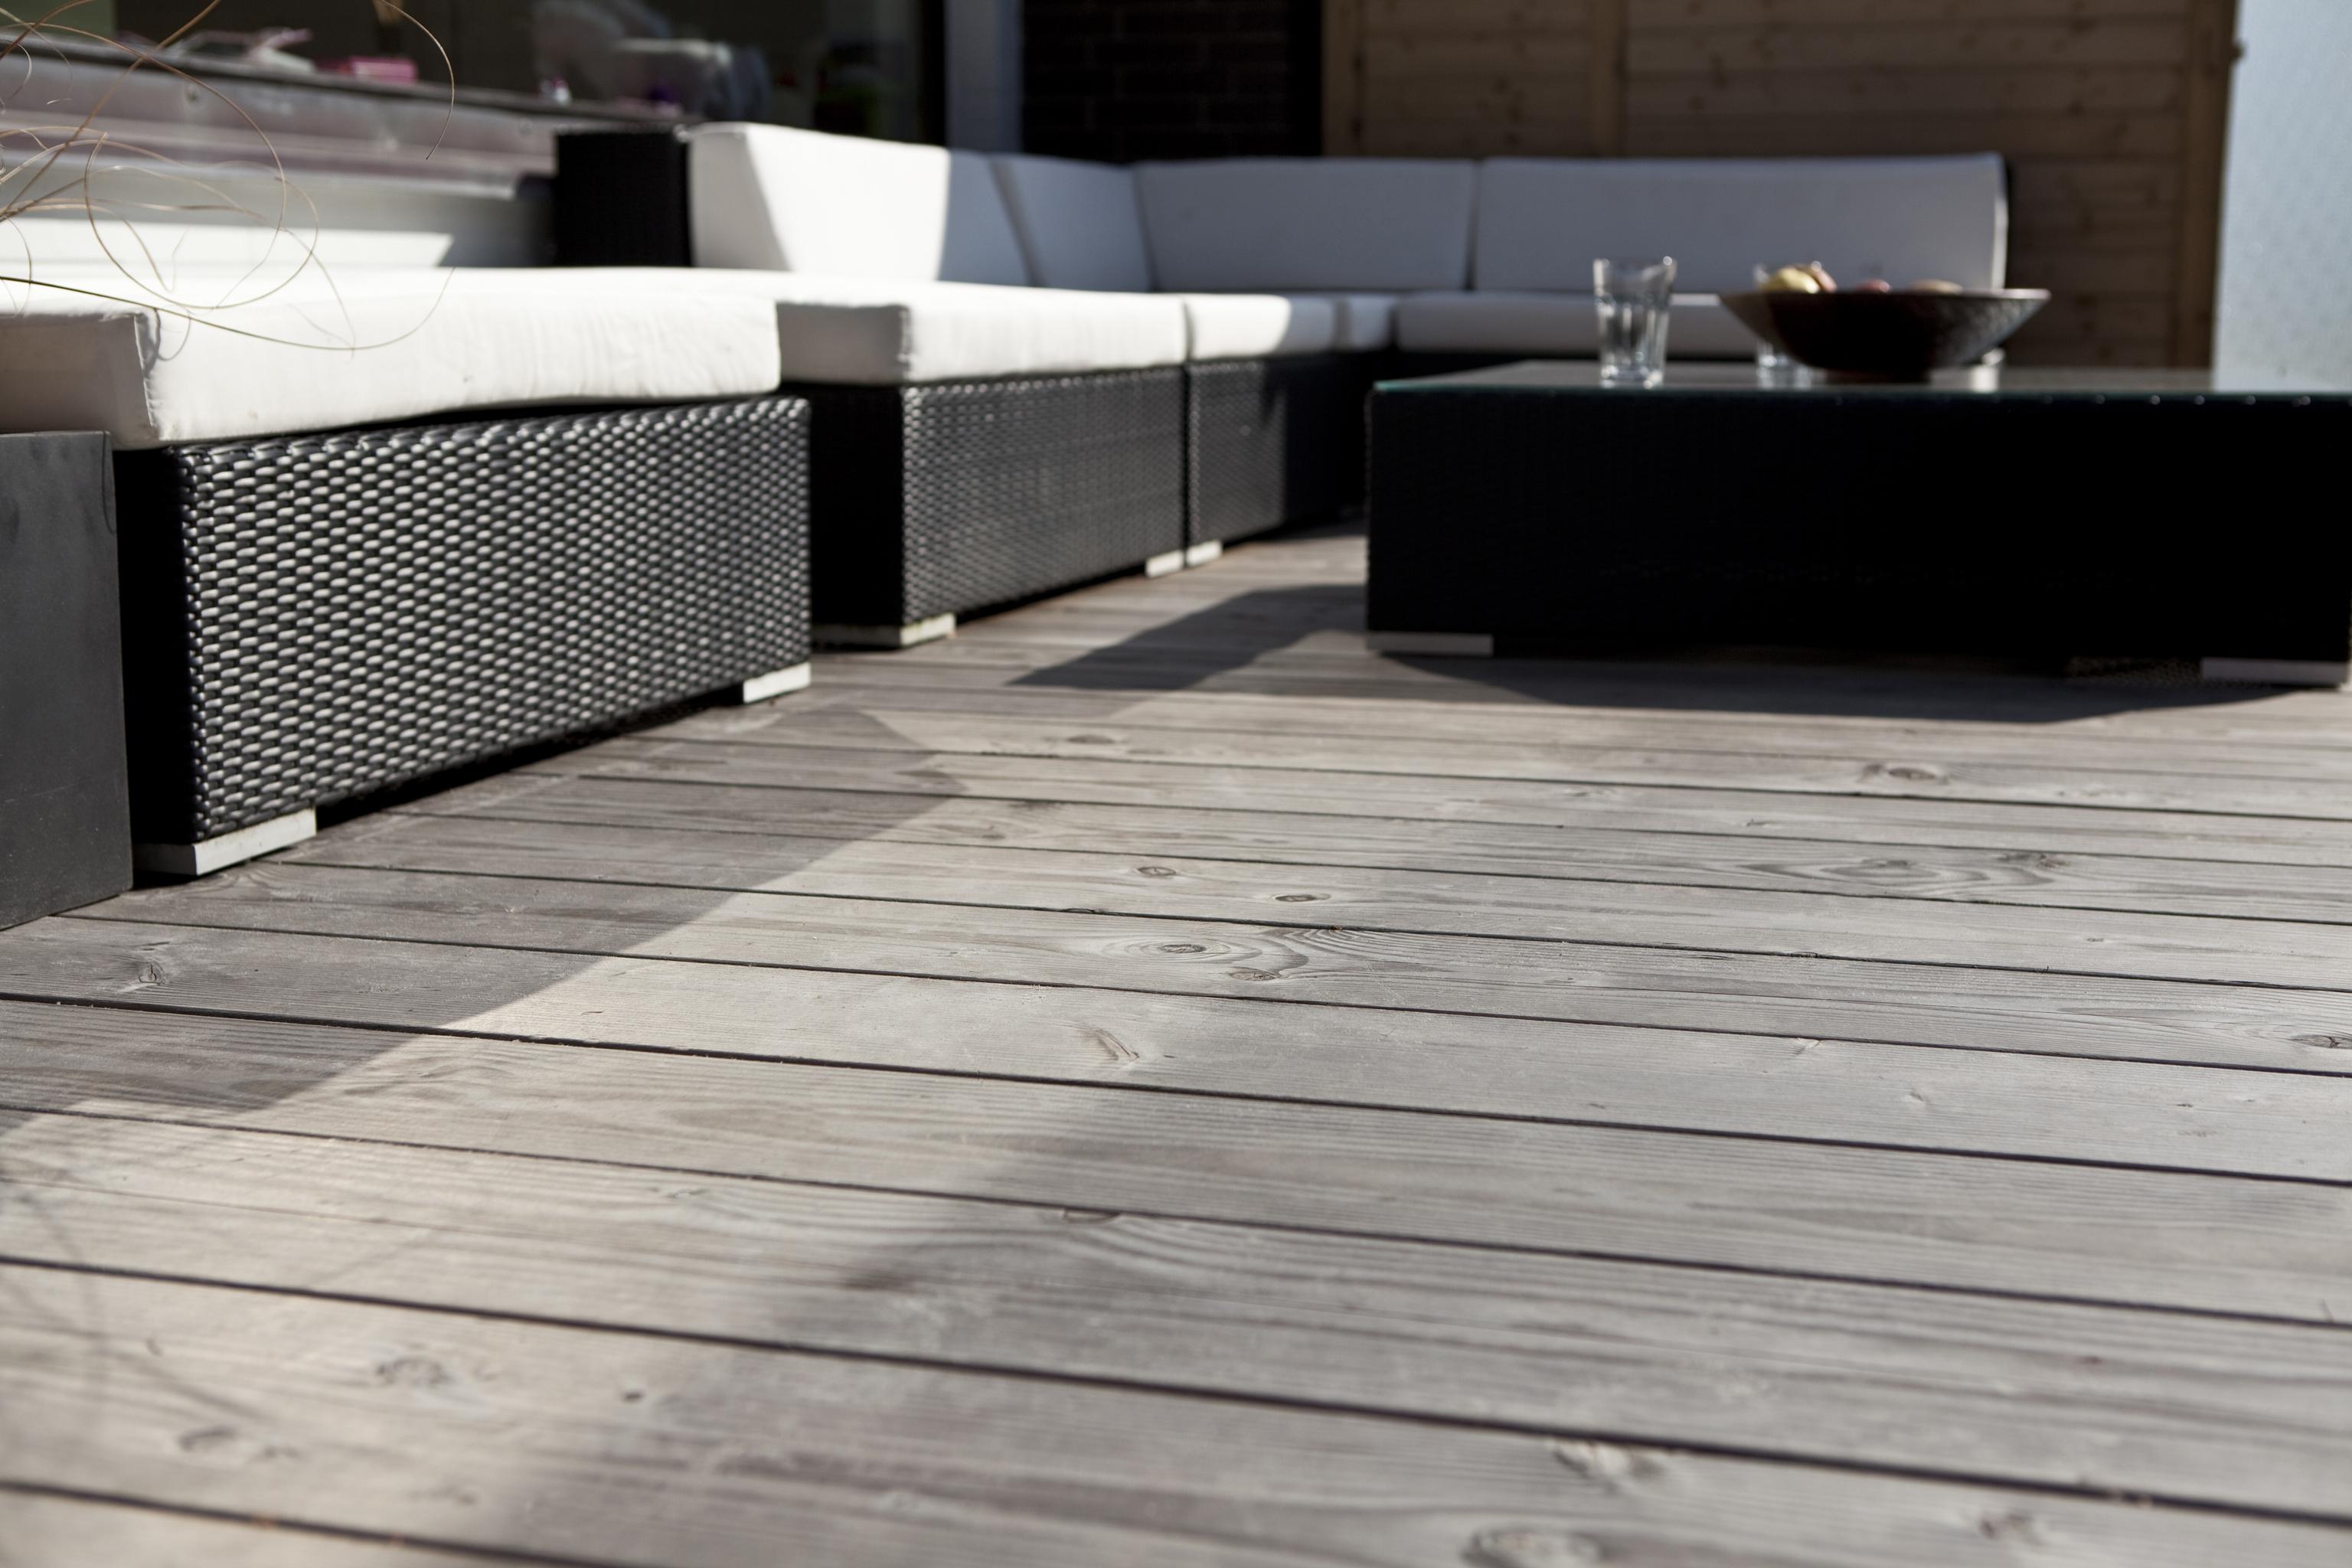 douglasie terrassendielen beste qualit t interiorpark. Black Bedroom Furniture Sets. Home Design Ideas